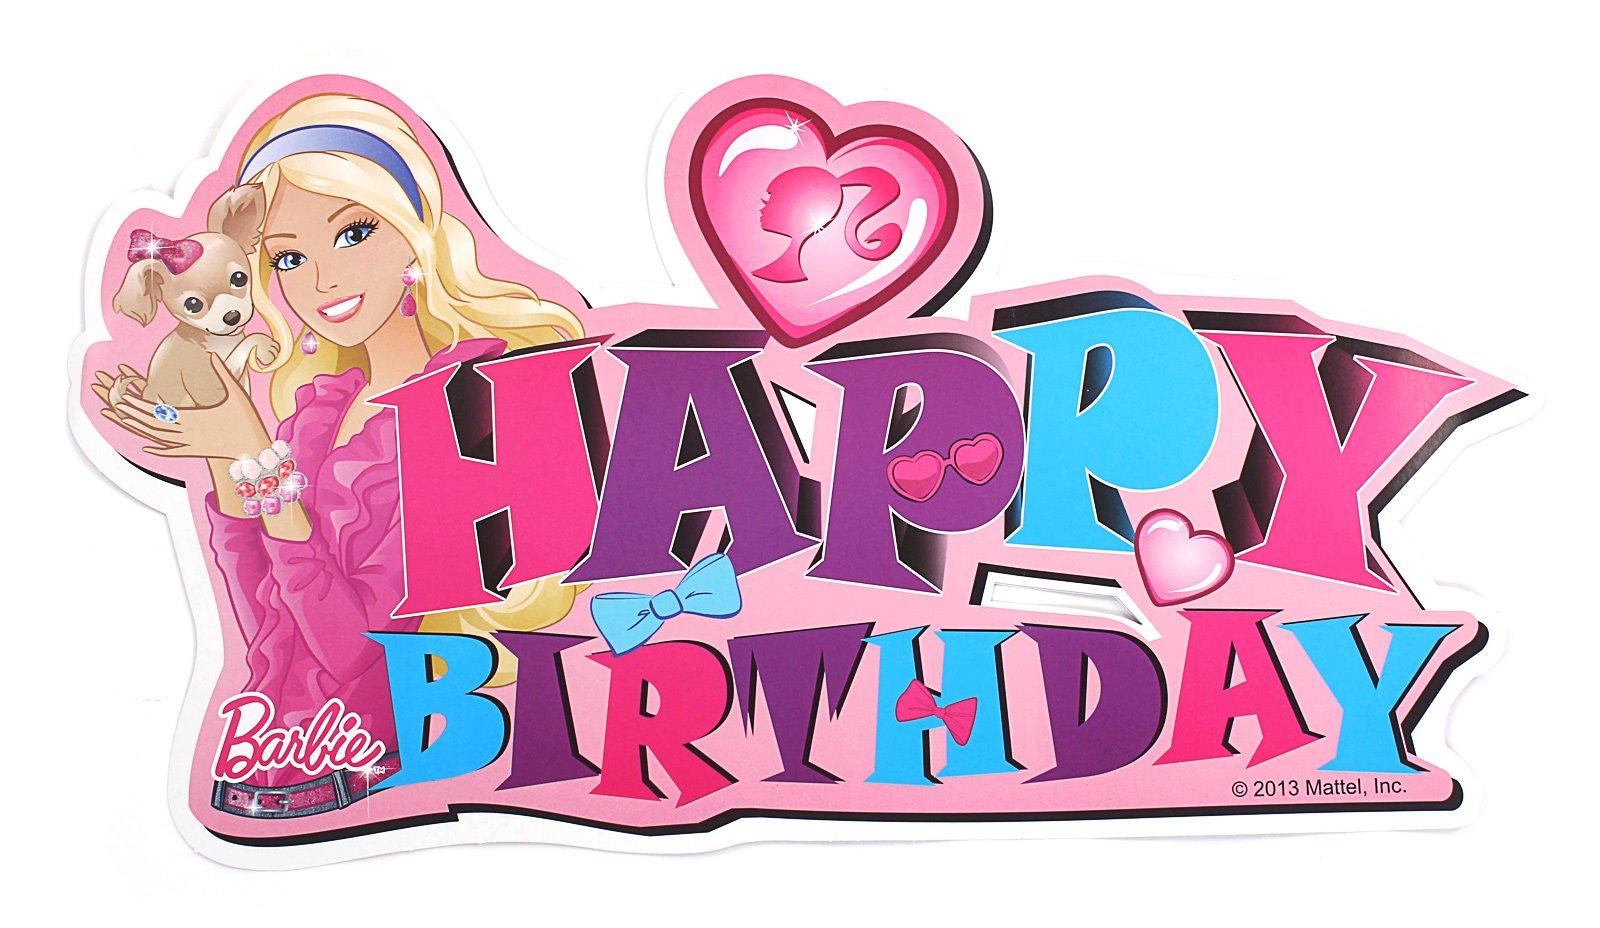 barbie birthday wallpaper - photo #18